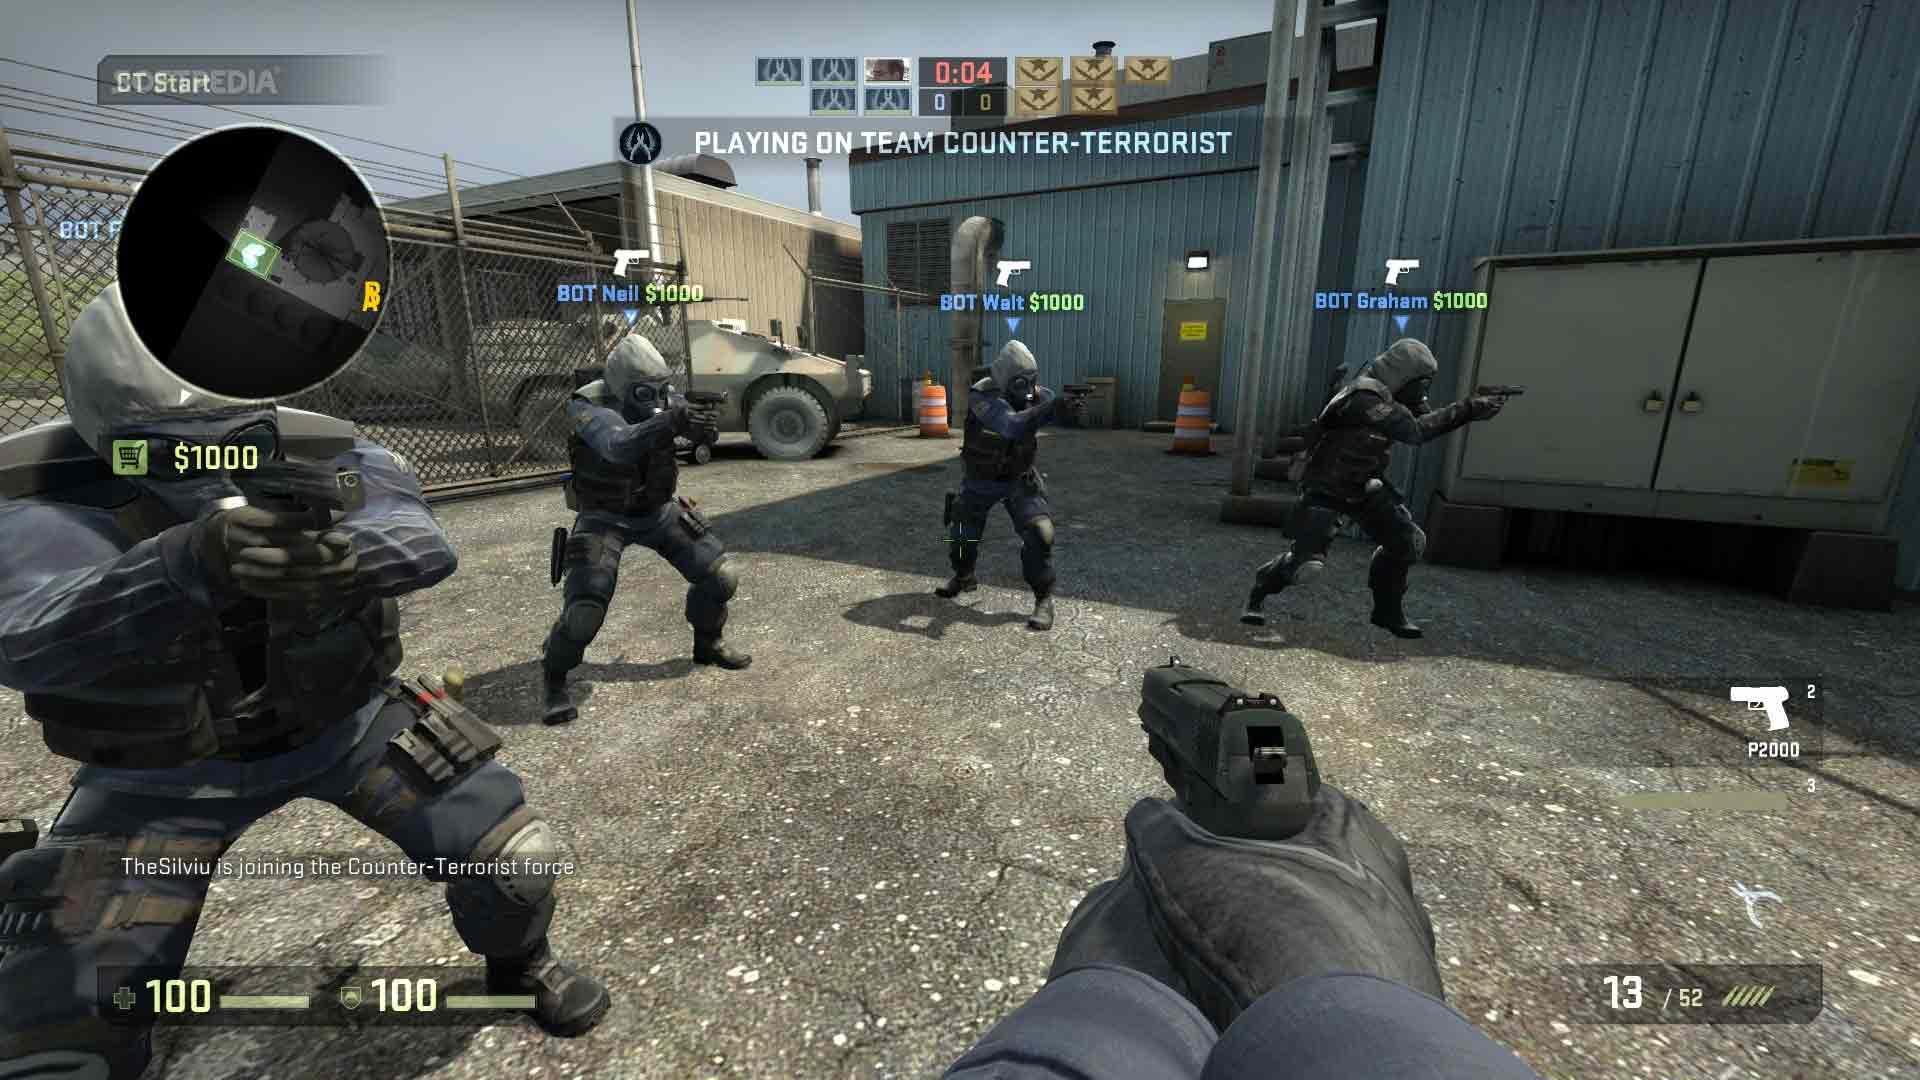 Counter-Strike-ไทย-บุก-ลุย-บู๊ระห่ำ2